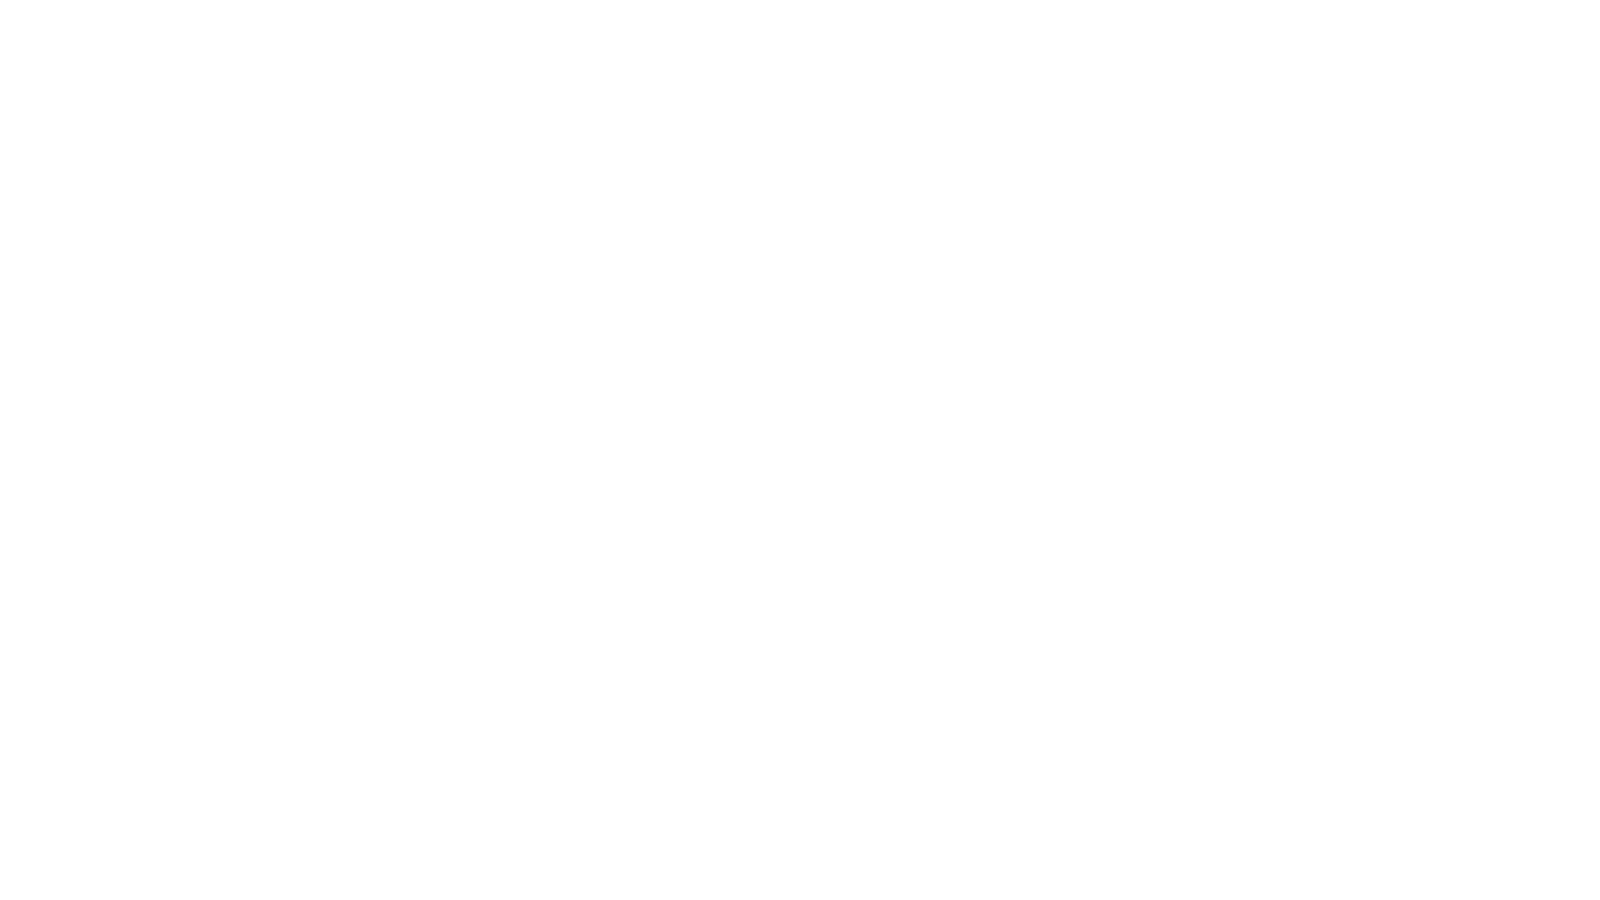 【LINE限定特典】※『再現性97%成果実証済みのノウハウ』を期間限定で配布中↓ https://kurohata.com/dpto  ①『再現性97%成果実証済みのノウハウ』講座 ②90分で10万円のノウハウ ③アフィリエイト完全マニュアル ④たった10記事でGoogleAdSenseを通す方法  チャンネル登録お願い致します!↓ https://www.youtube.com/channel/UC7MBDeBibEoZc8FbWbcEirw  僕のBLOGはこちら↓ https://kurohata.com/  Twitter↓ https://twitter.com/hayatobloger  Instagram↓ https://www.instagram.com/kurohatabloger/channel/?hl=ja   僕が脱サラするまでにしてきた事↓ https://kurohata.com/datsusara/  僕の毎月の収益はこちら↓ https://kurohata.com/category/earning/  #お金を稼ぐ #お金を稼ぐ方法 #お金の勉強